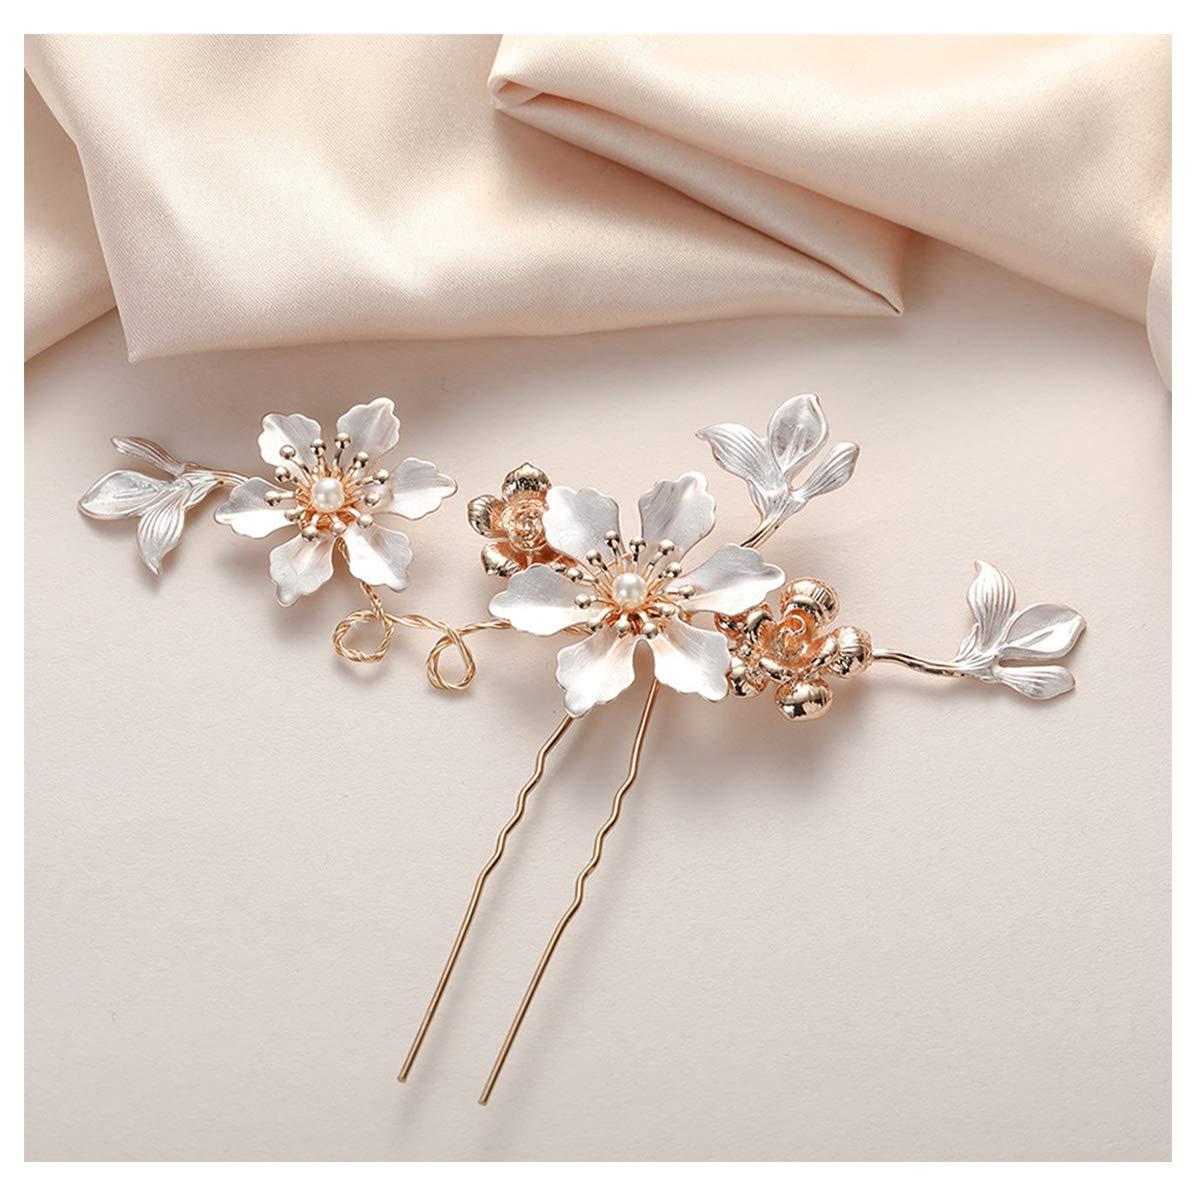 SWEETV Gold Wedding hair pin Handmade Bridal Hairpin Gold Wedding Hair Accessories for Brides